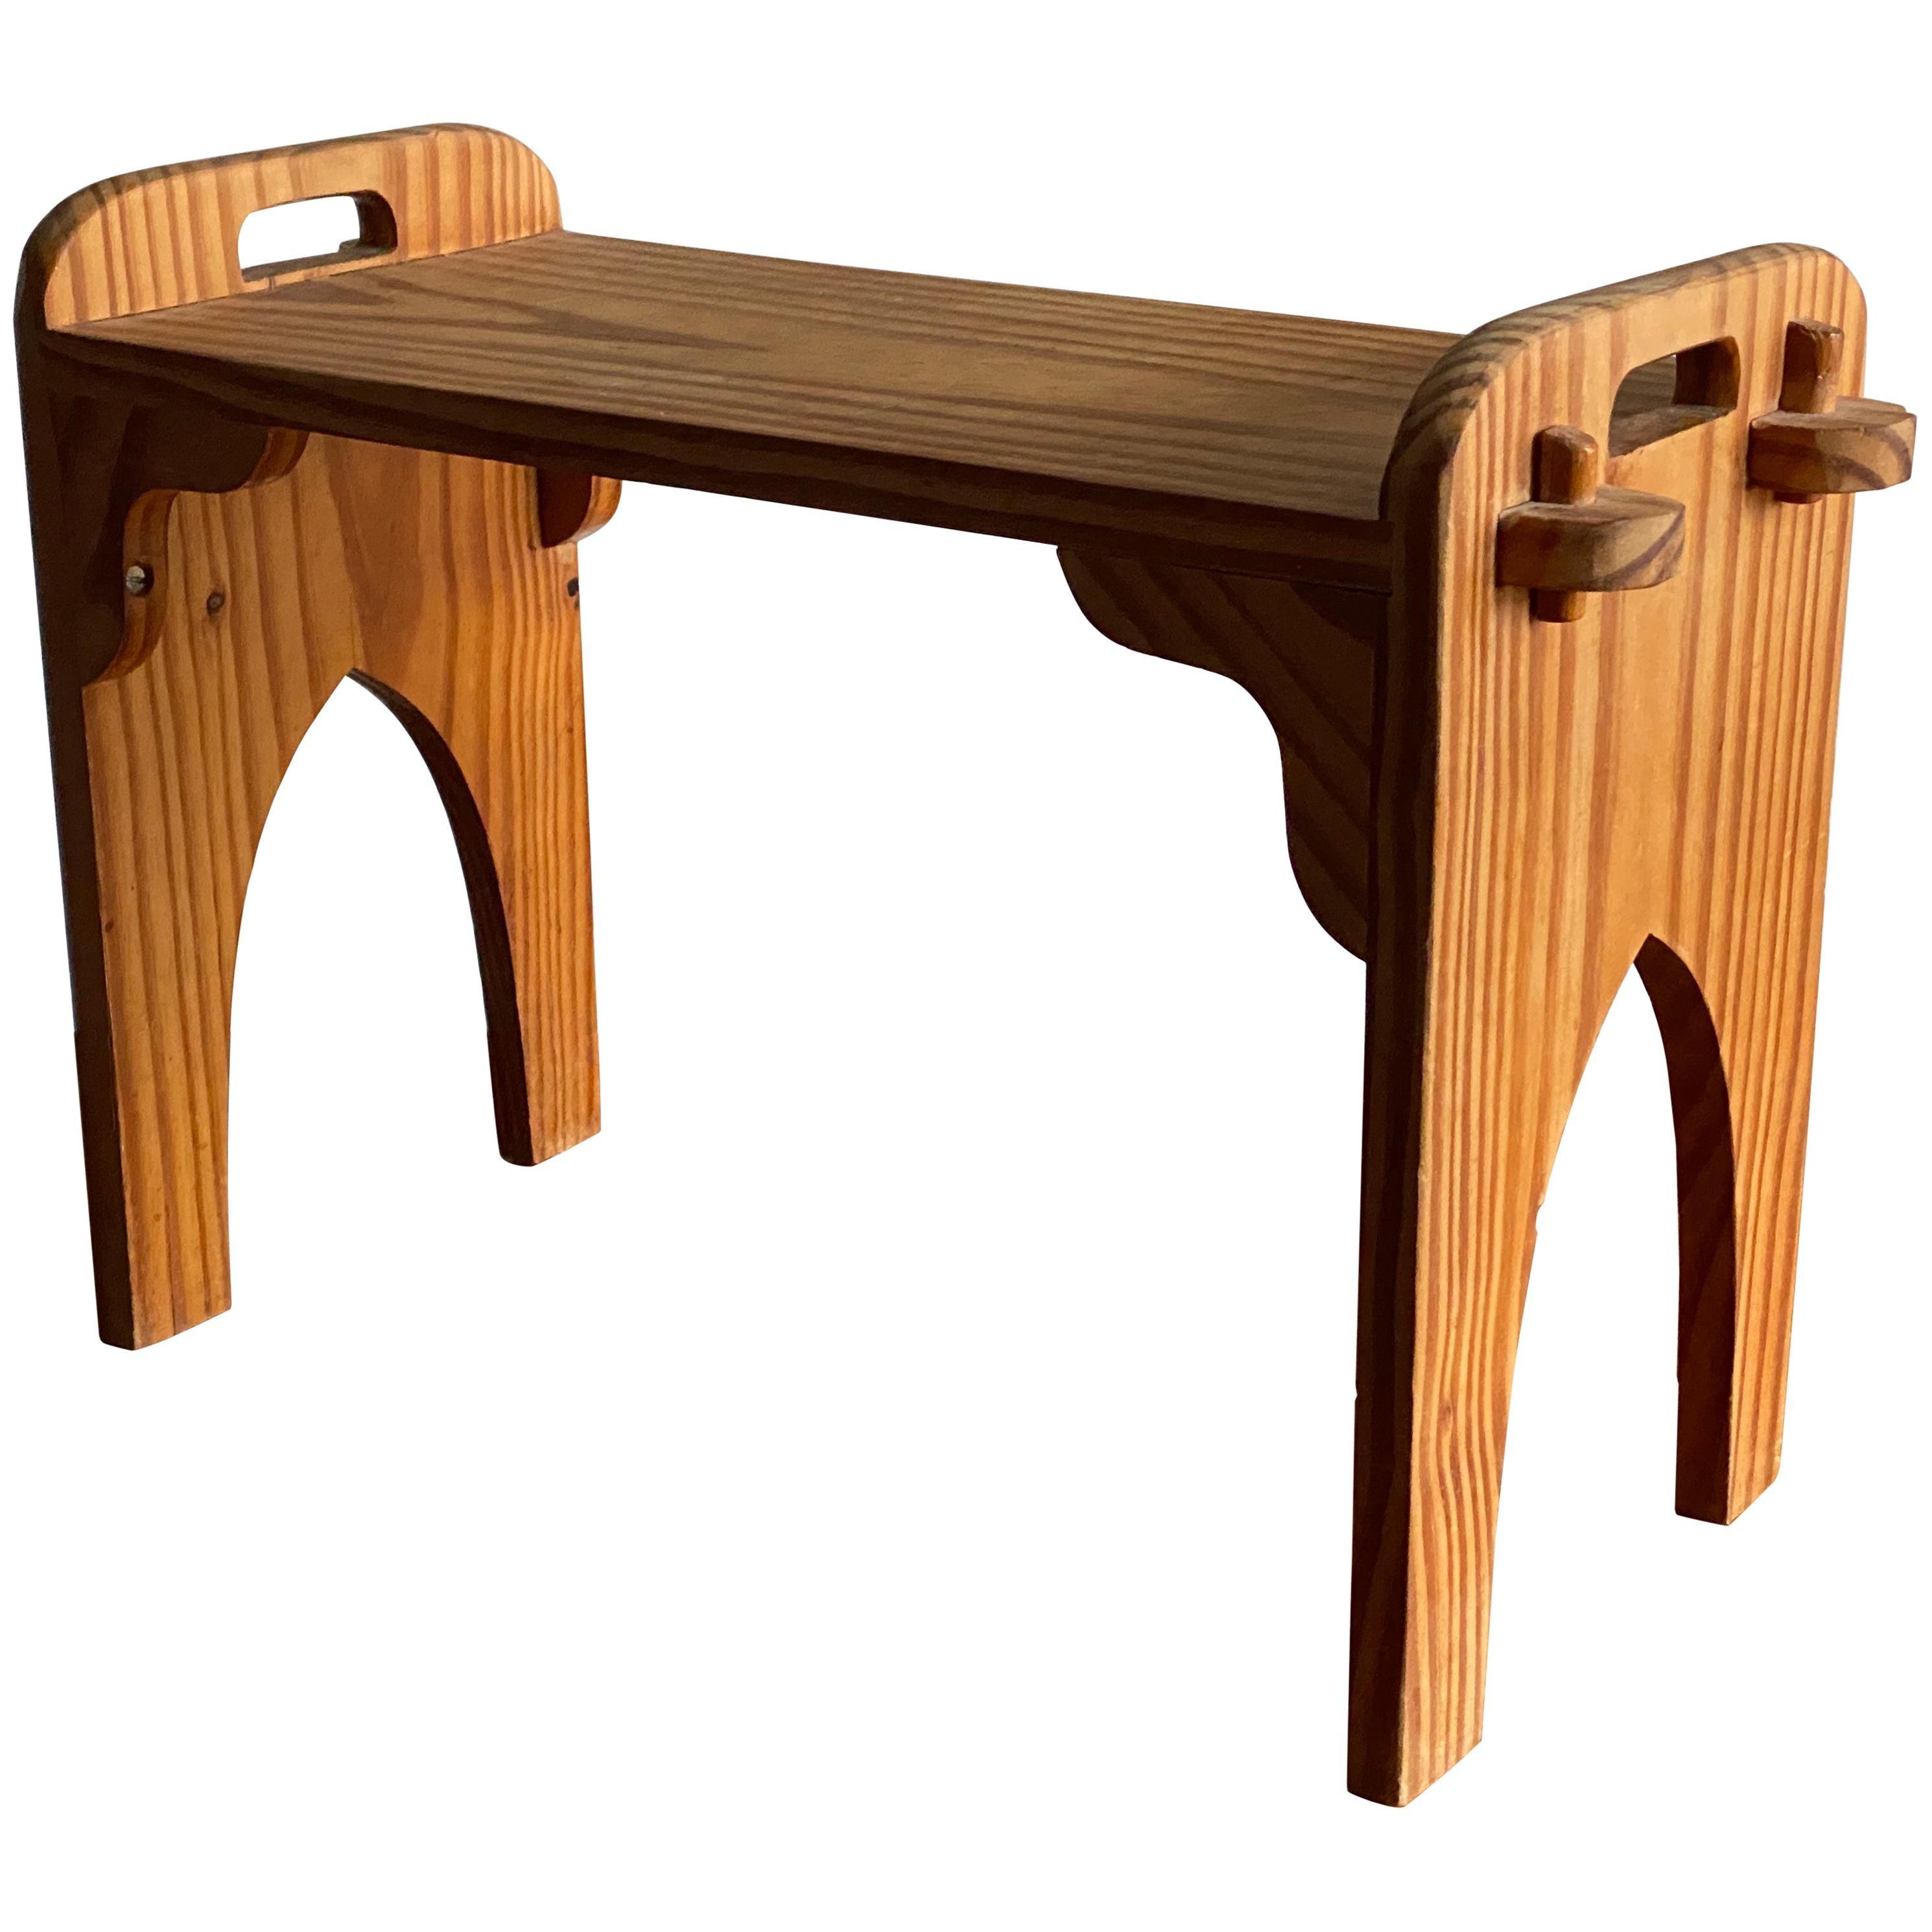 Swedish Handicraft, Rustic Minimalist Stool, Solid Pine, Sweden, 1967